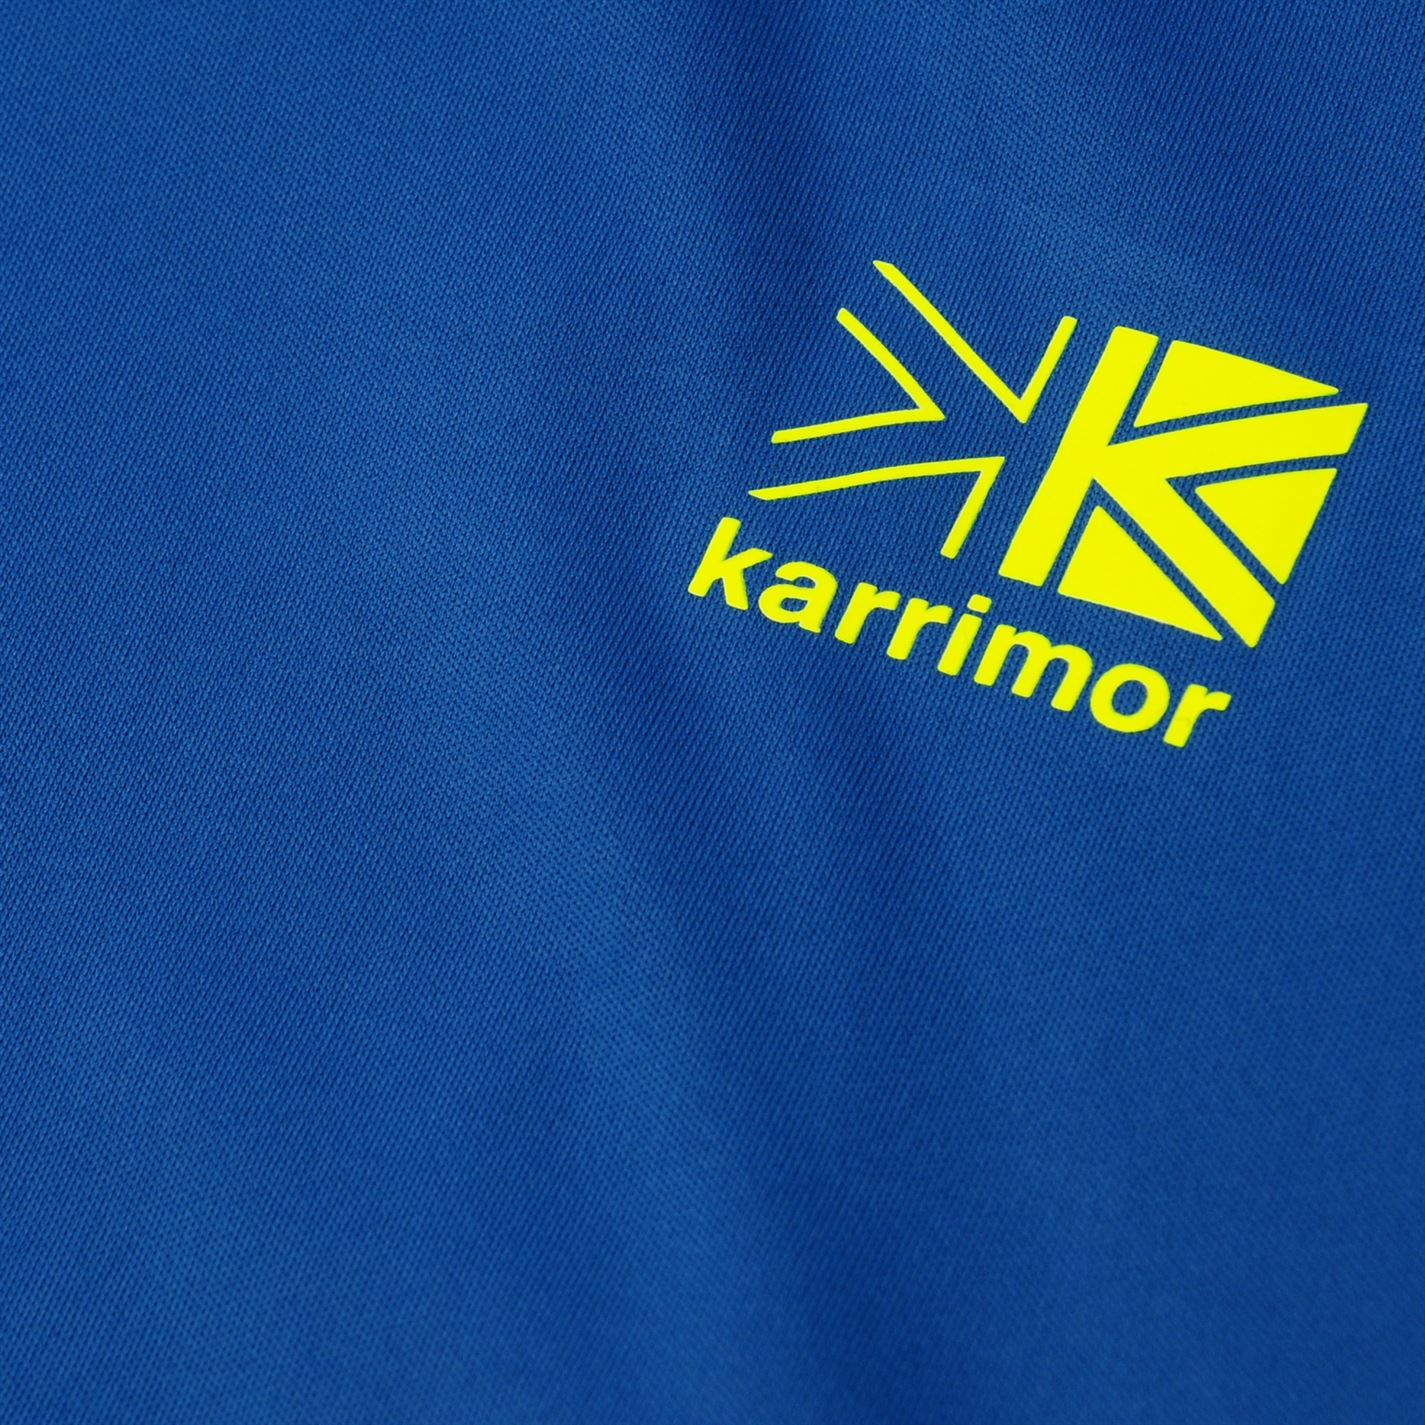 Karrimor-Hombres-X-Lite-Camiseta-mangas-cortas-de-carrera-Rendimiento-Camiseta-Top-Cuello-Redondo miniatura 20